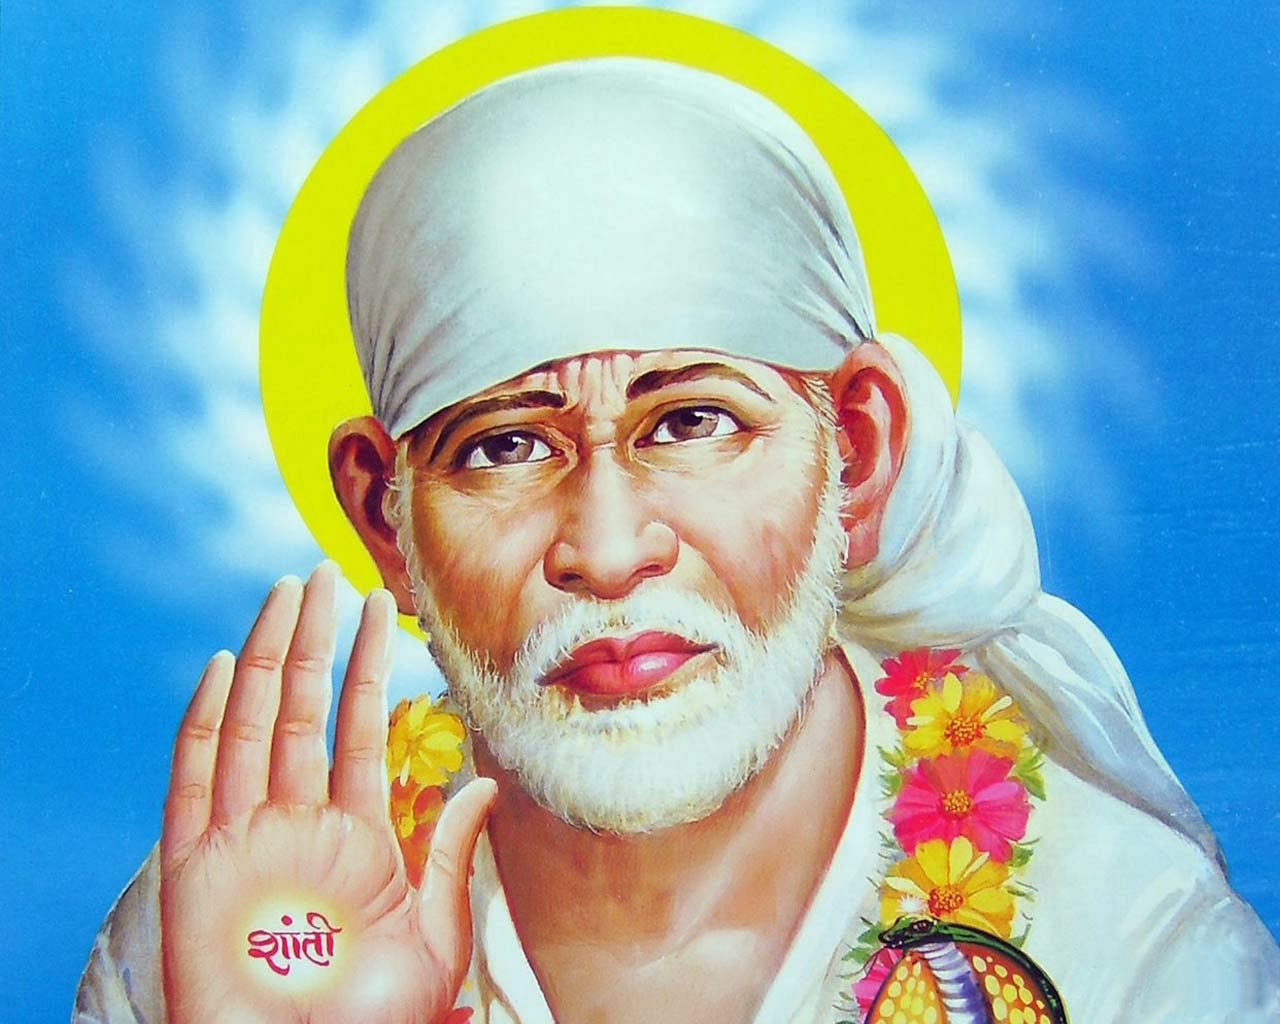 Happy Holi Full Hd Wallpaper Sai Baba Hd Wallpapers Collection Free Download Hd